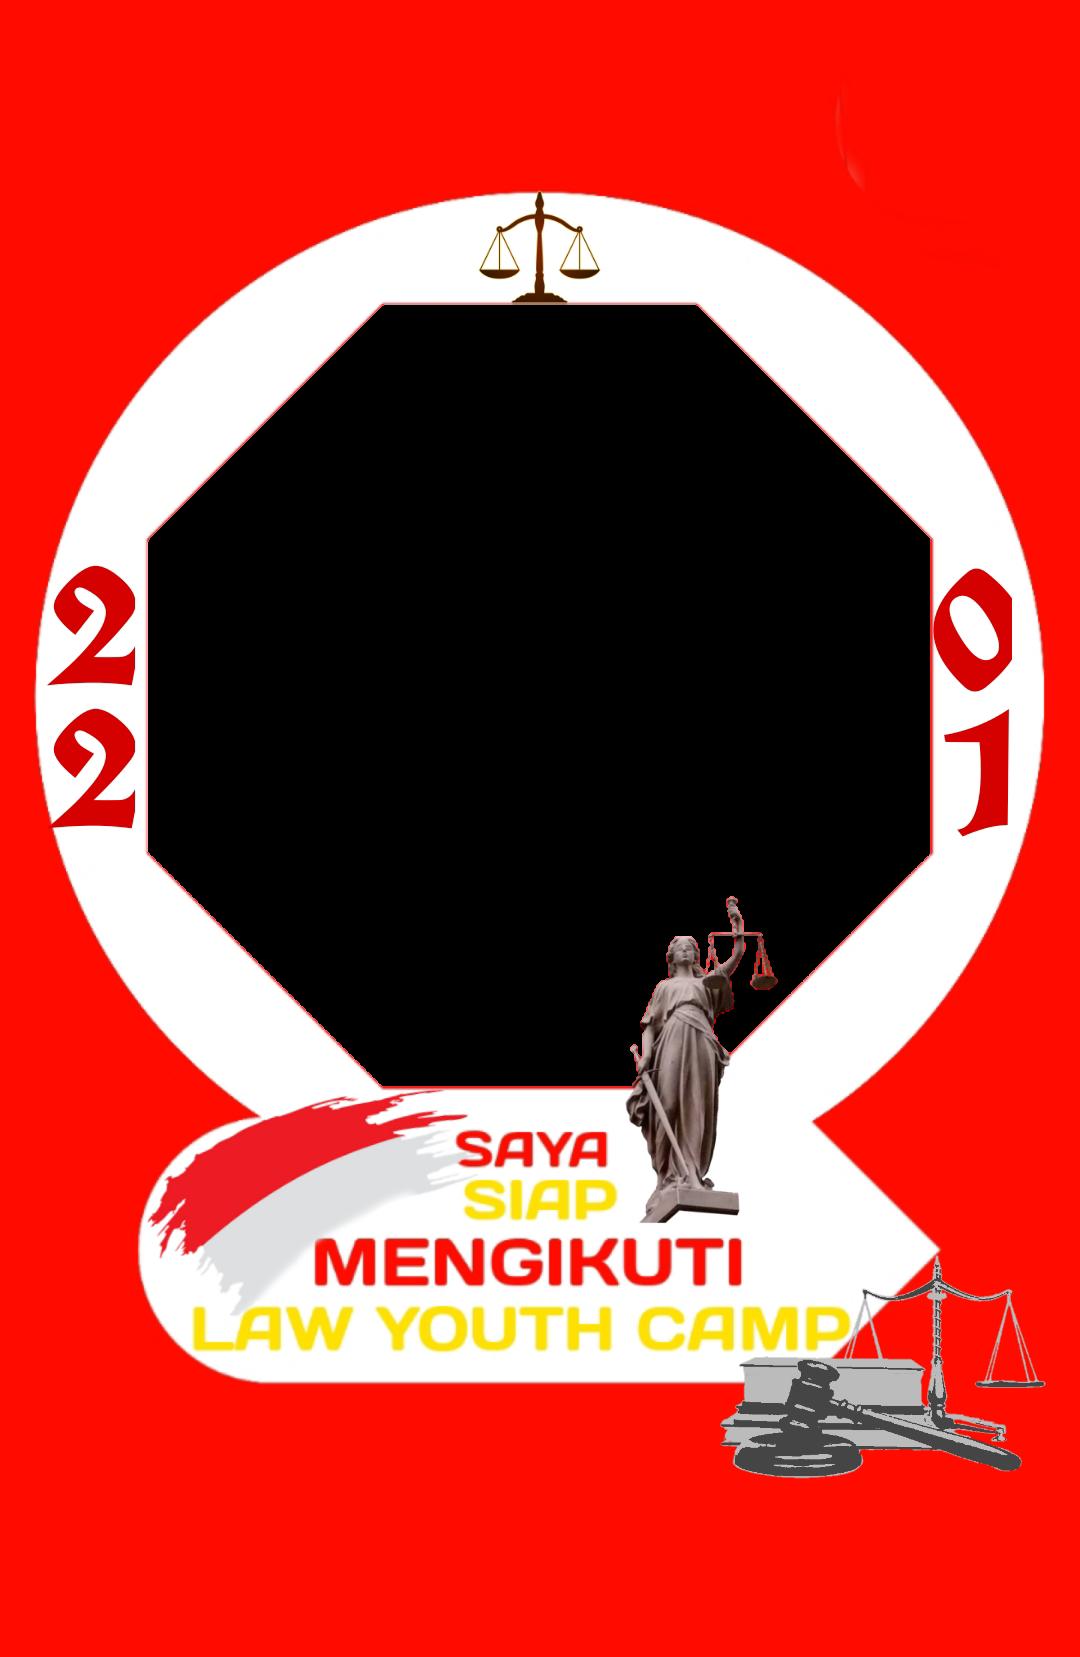 Download Background Twibbon Law Youth Camp buatan Aan Samsu